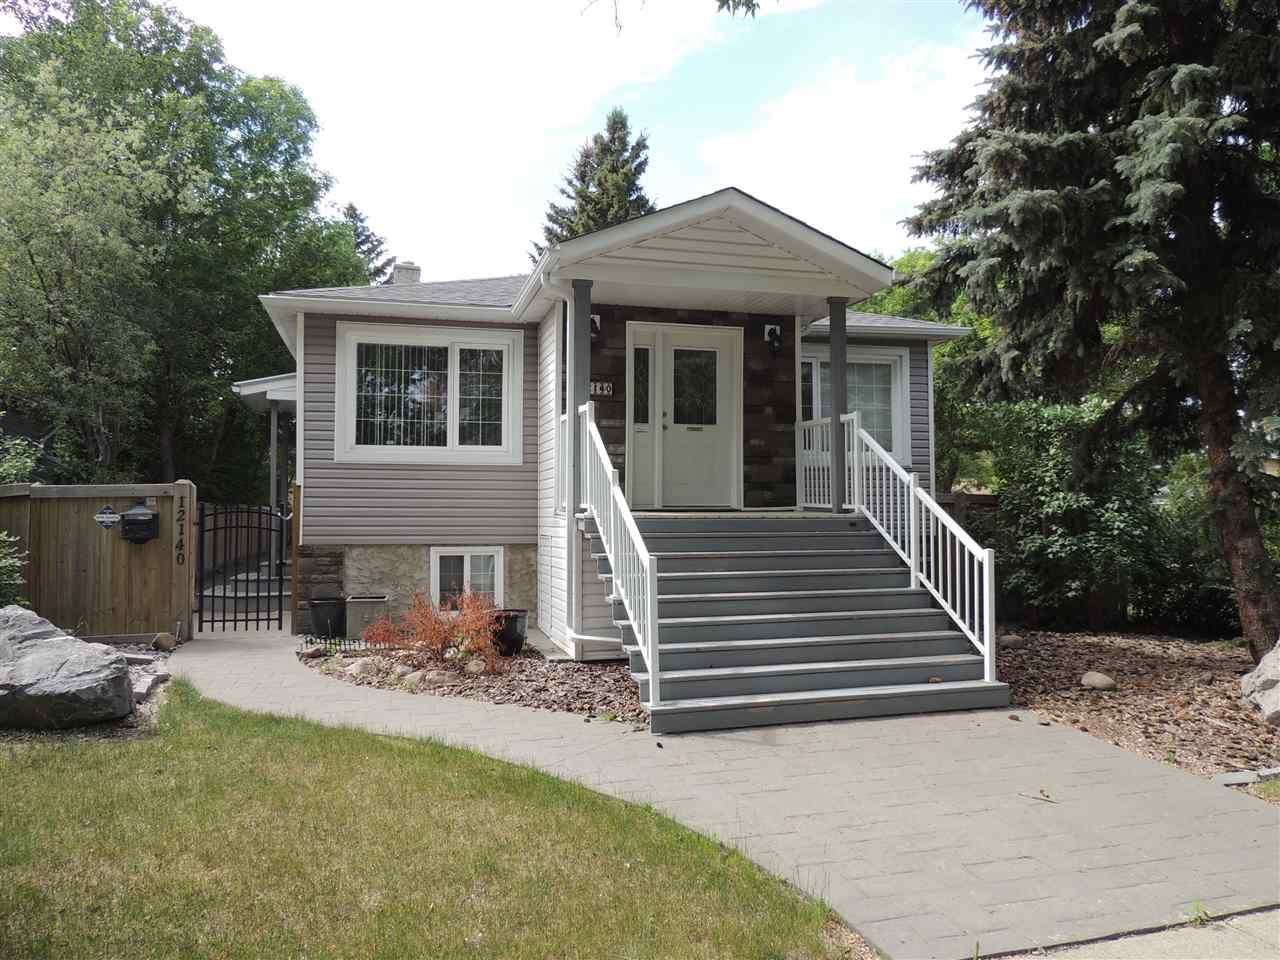 Buliding: 123 St Nw, Edmonton, AB